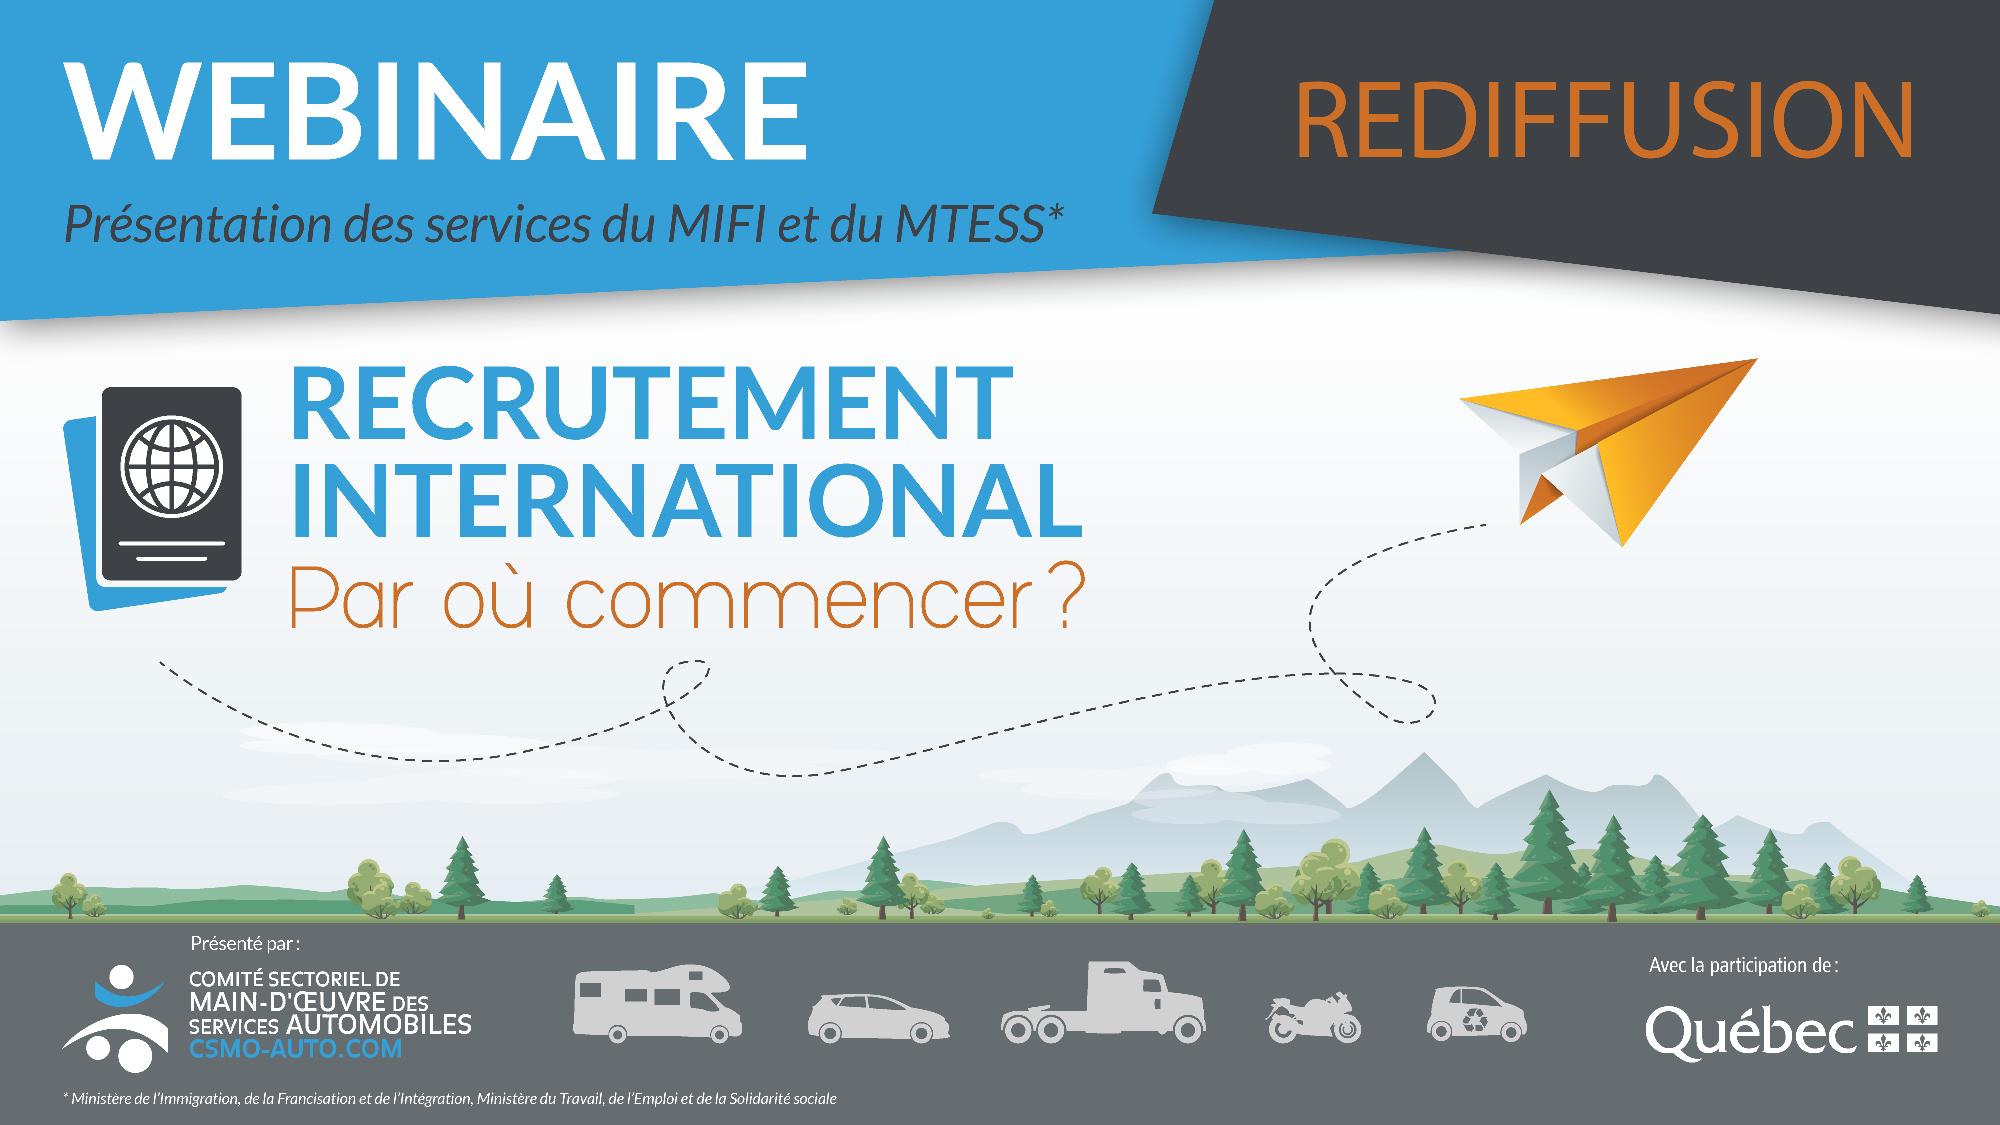 REDIFFUSION - WEBINAIRE : Recrutement international - Par où commencer?